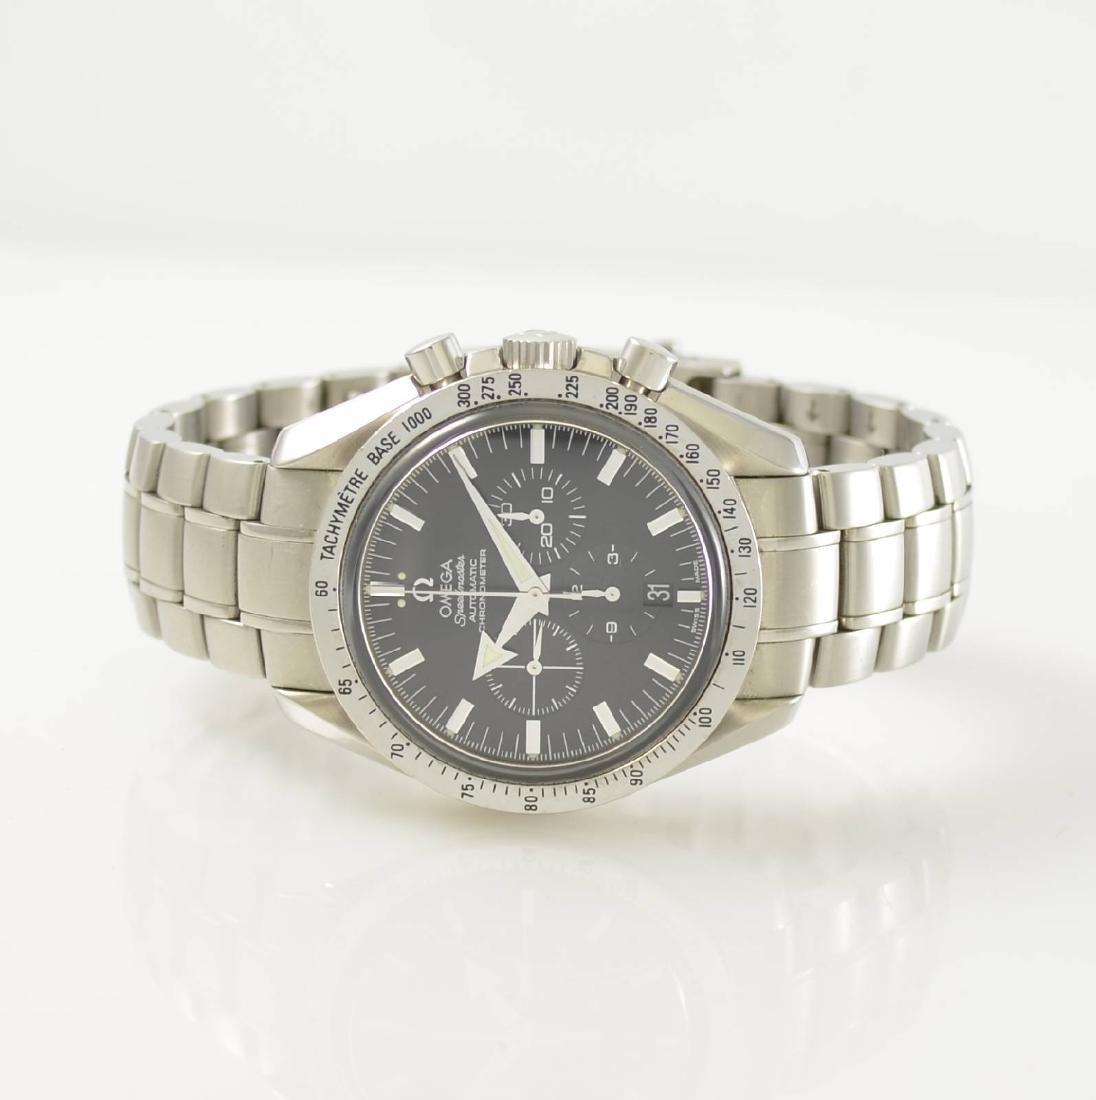 OMEGA Speedmaster Broad Arrow chronometer wristwatch